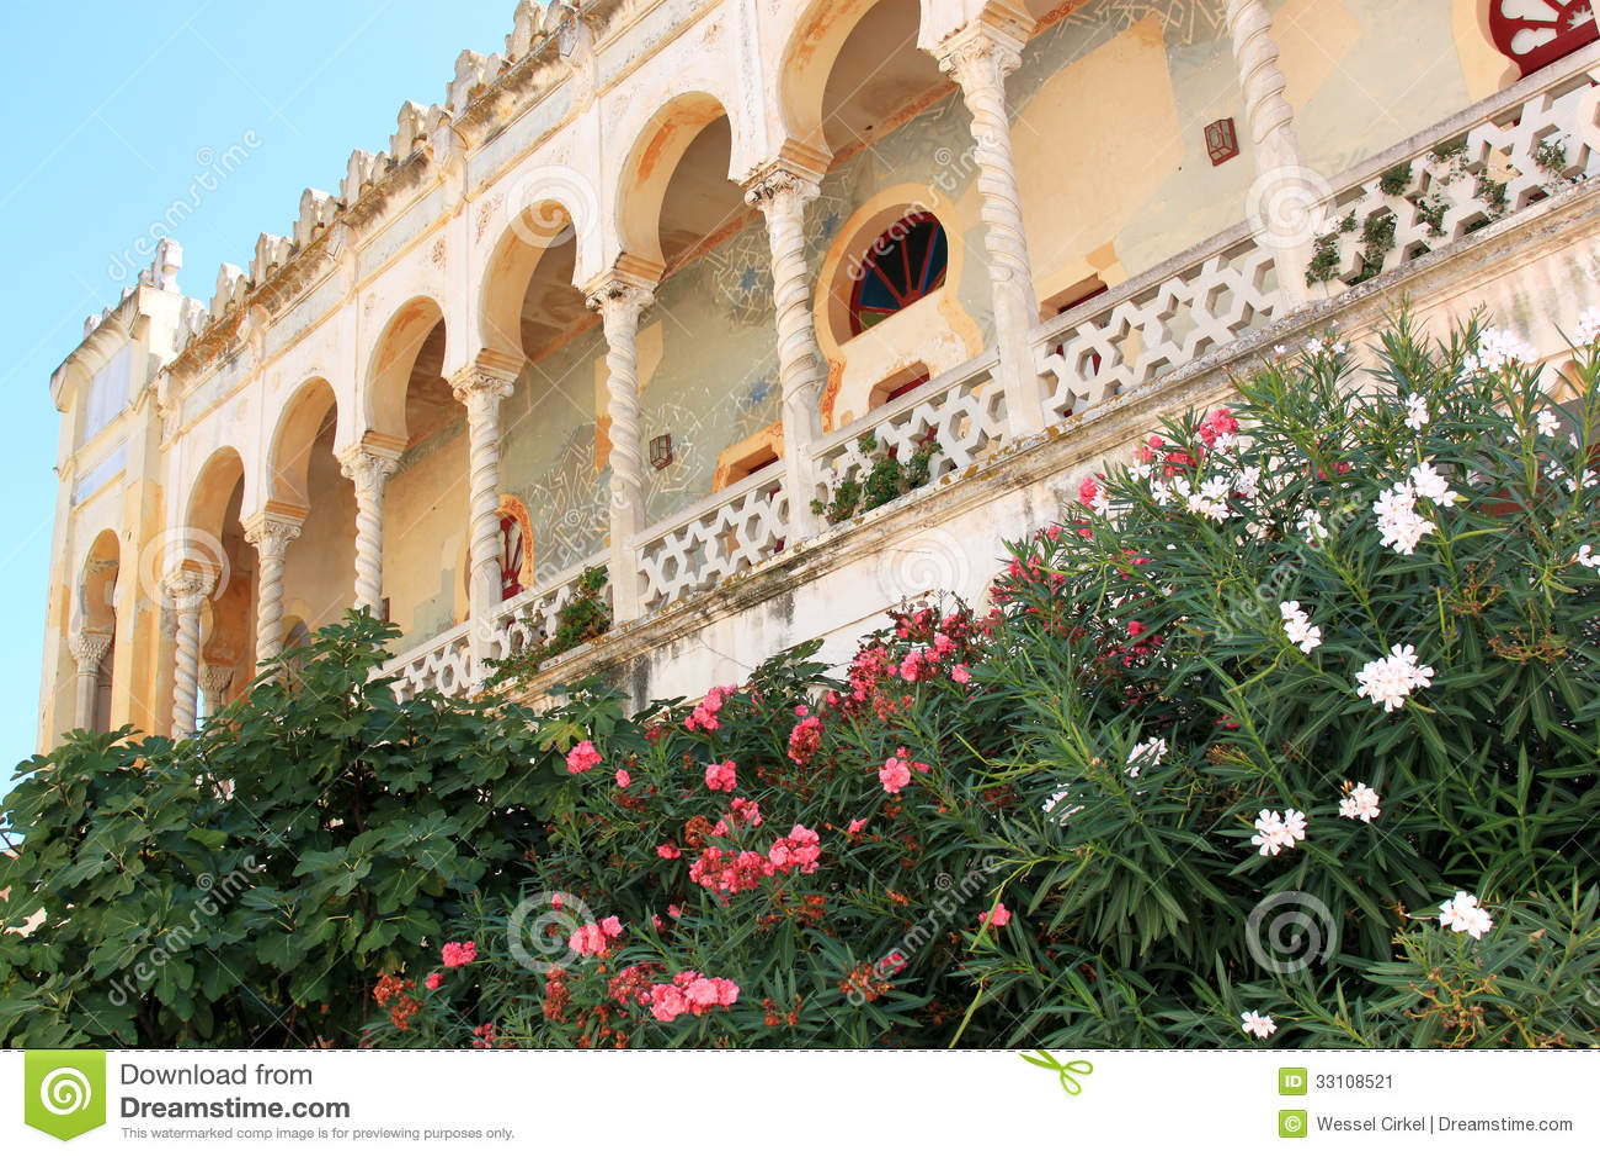 Santa Cesarea Terme Italy  city images : Palazzo Sticchi, Santa Cesarea Terme, Puglia, Italy Stock Image ...